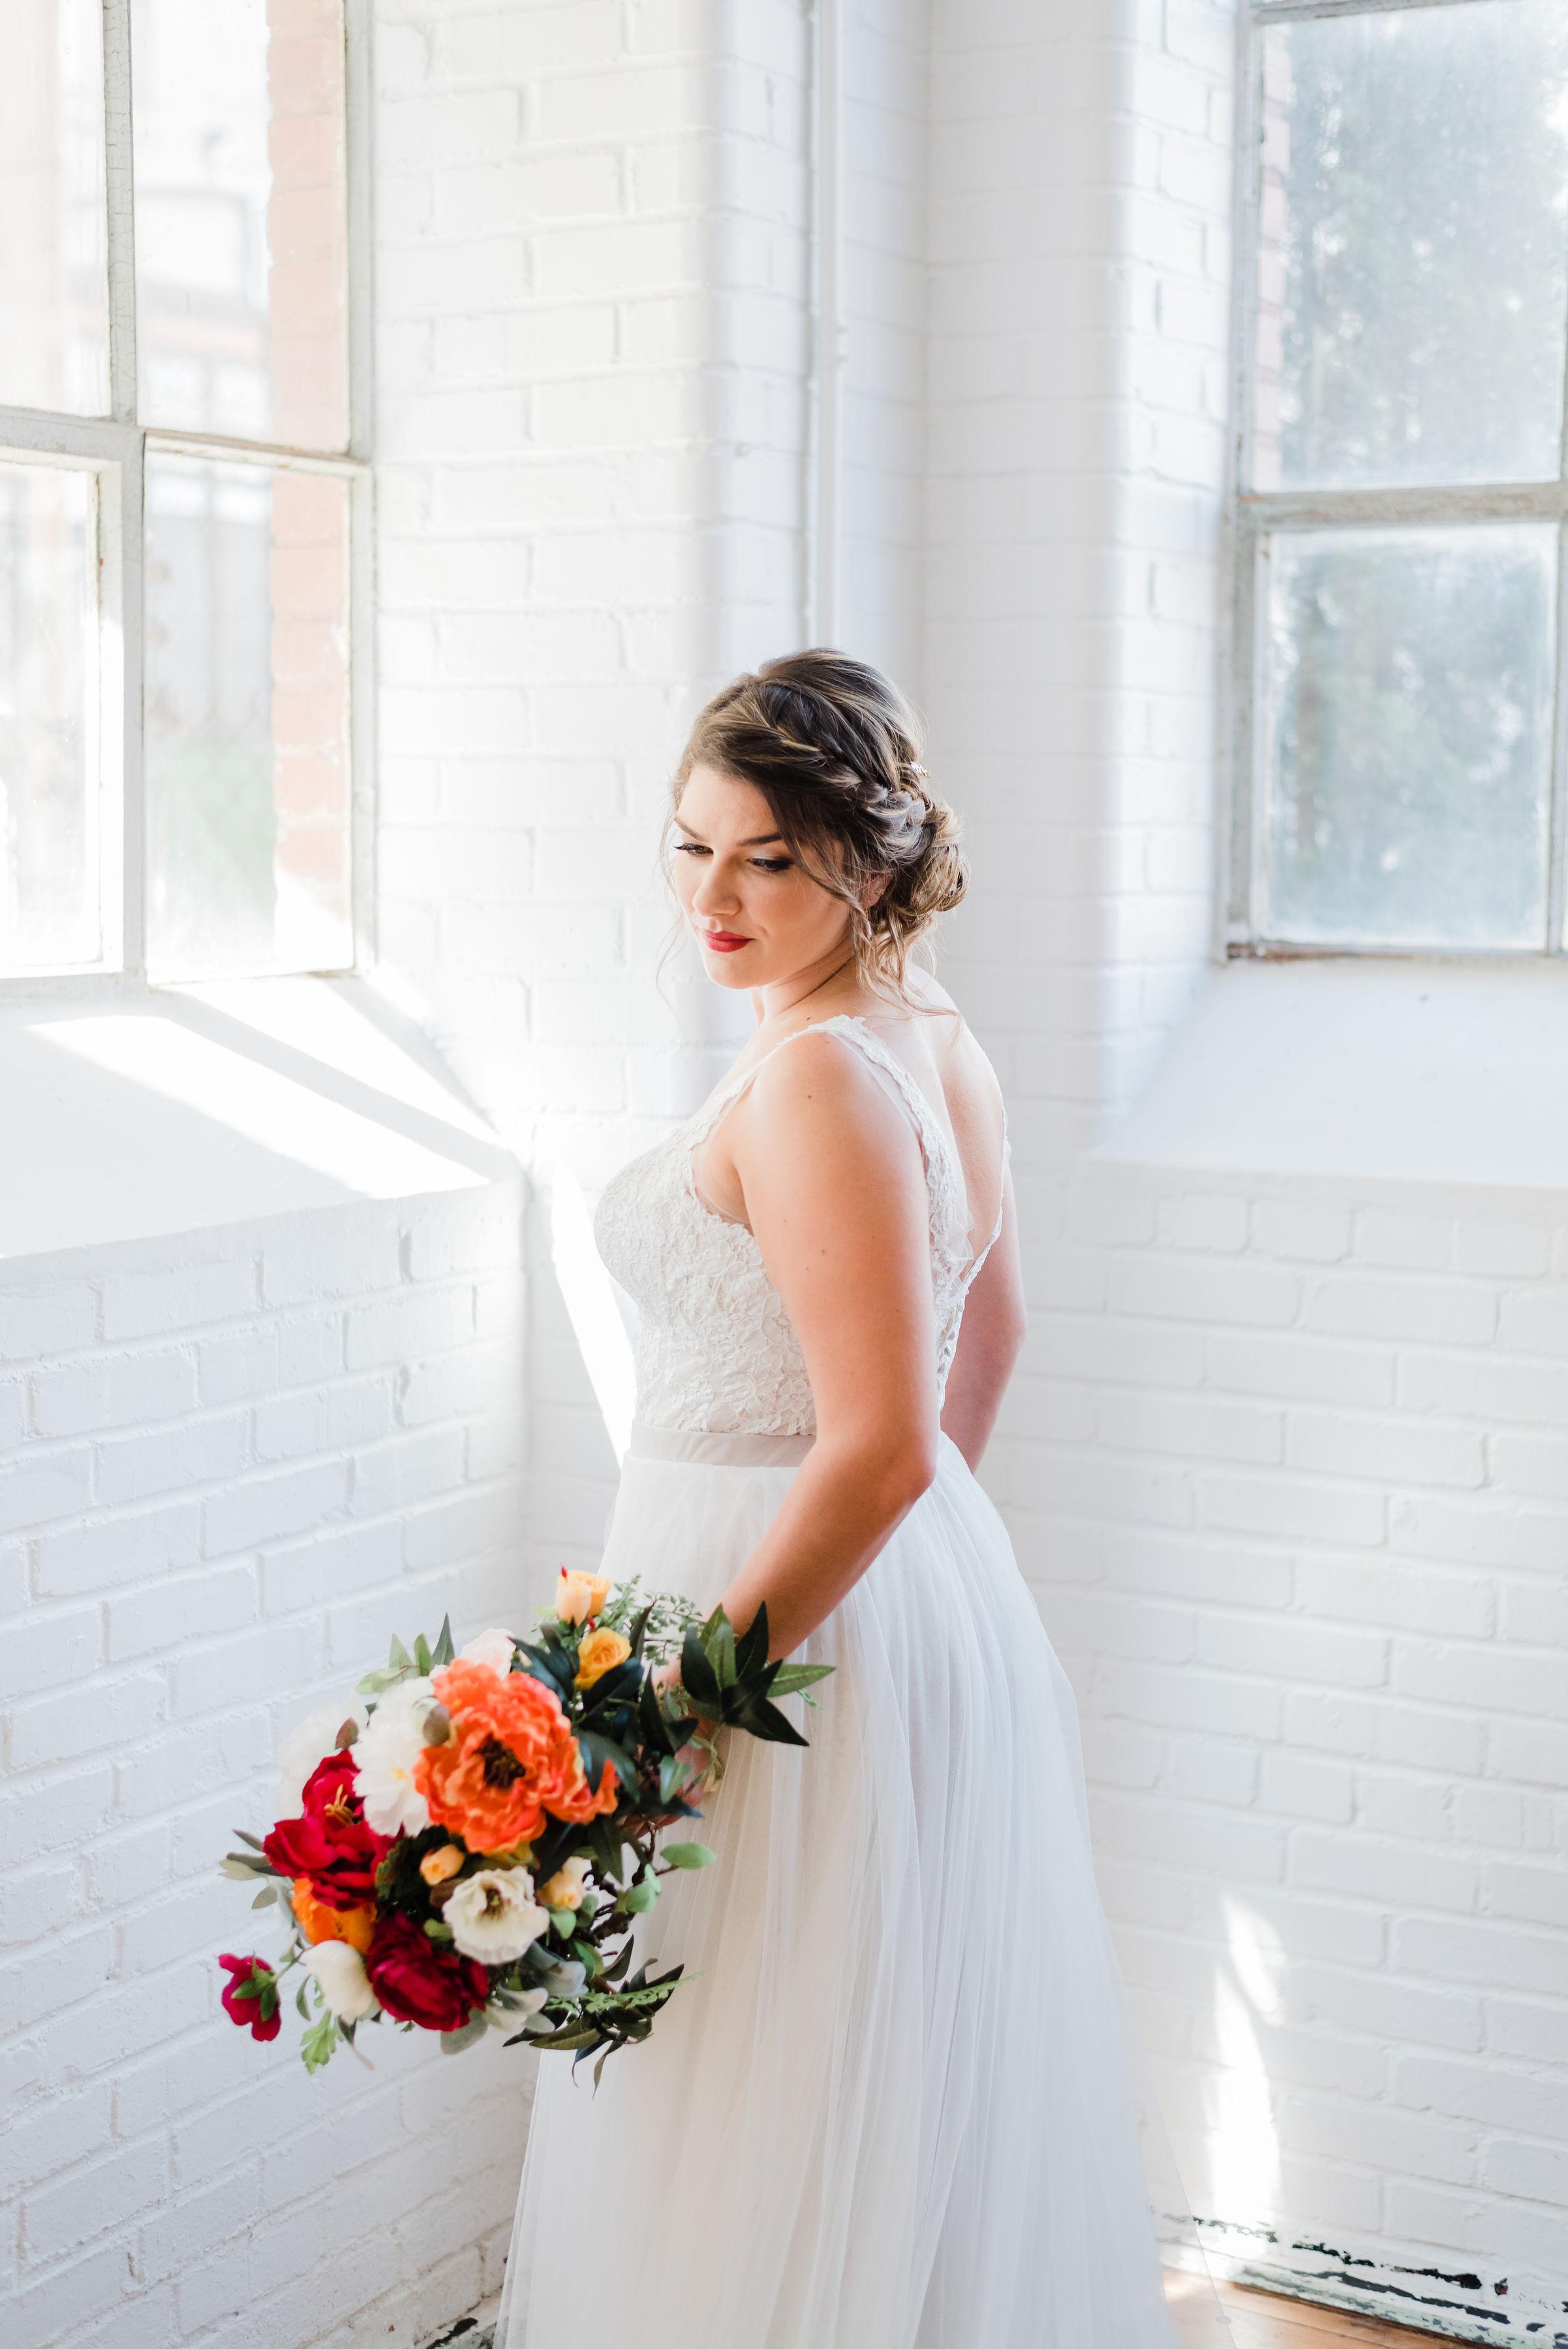 TaylorAdams_bridals-50.jpg